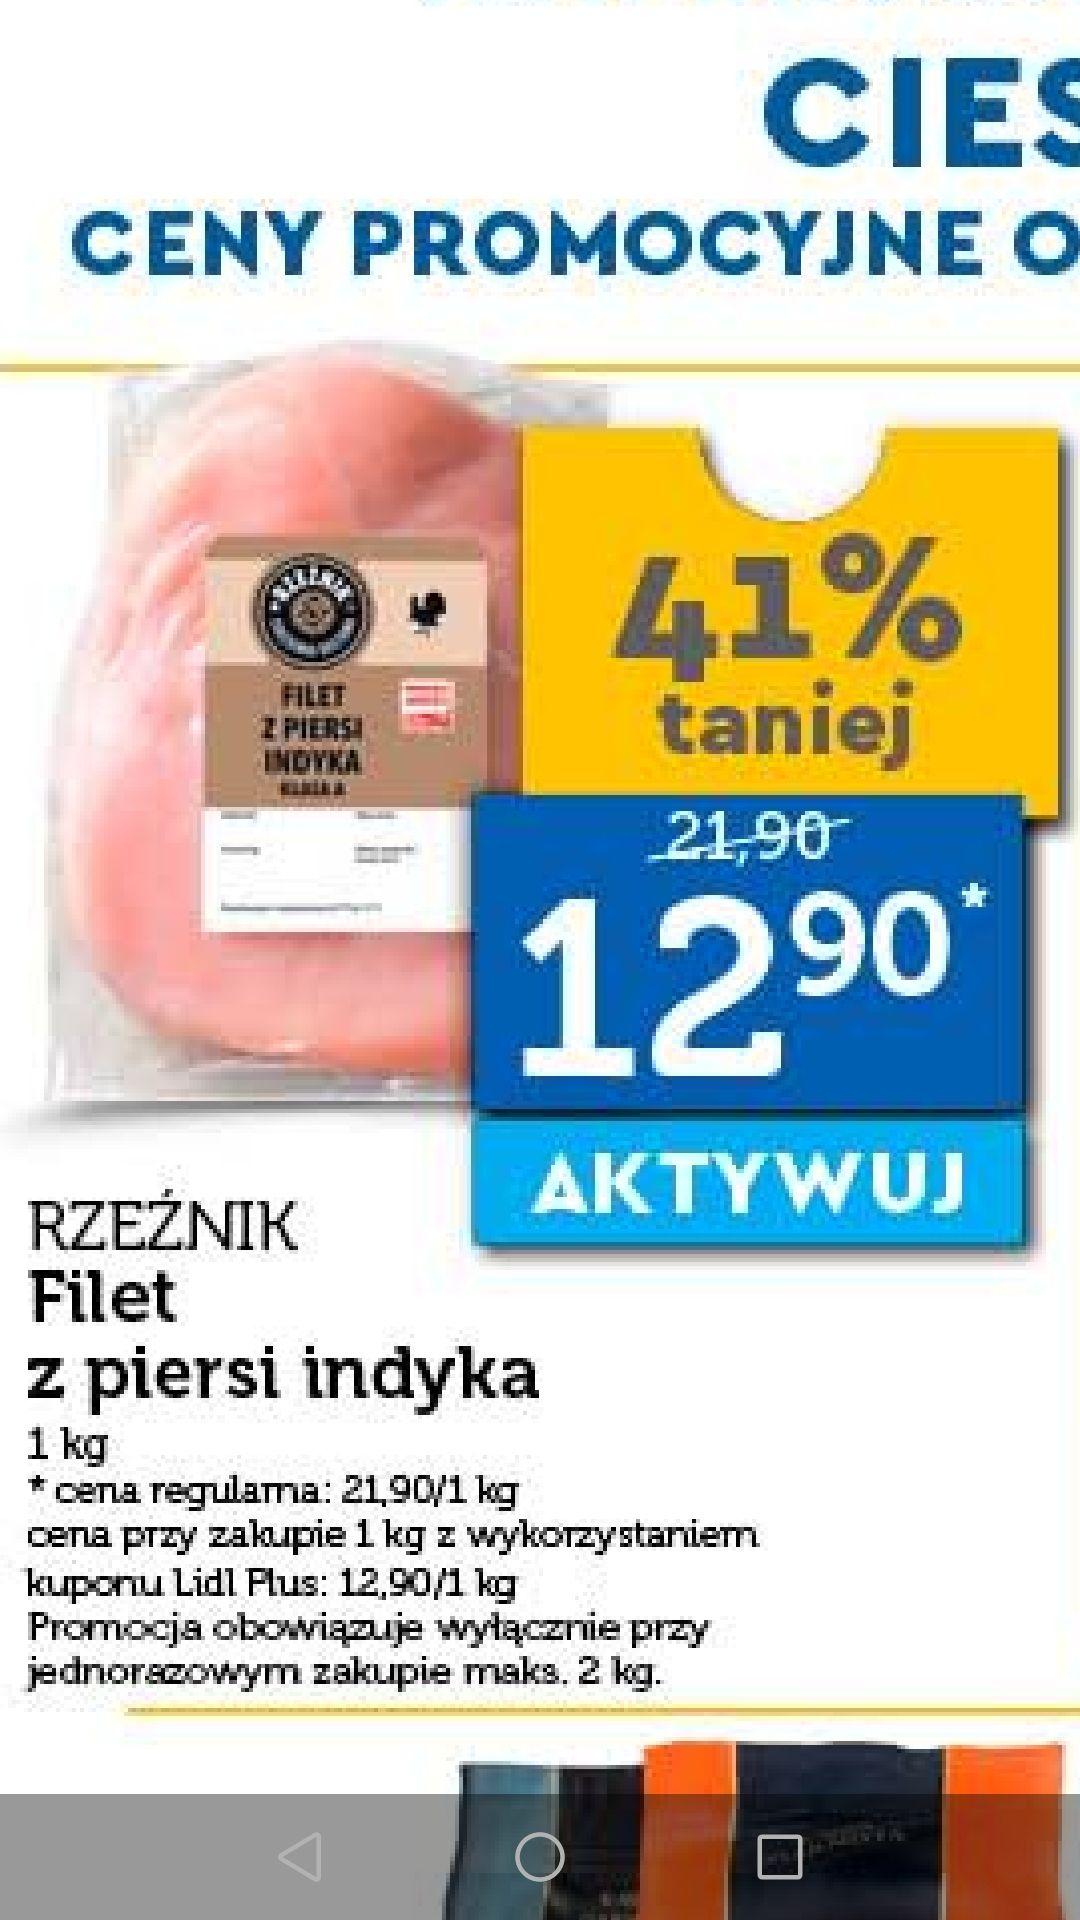 Filet z piersi indyka kupon Lidl Plus od wtorku 23.04